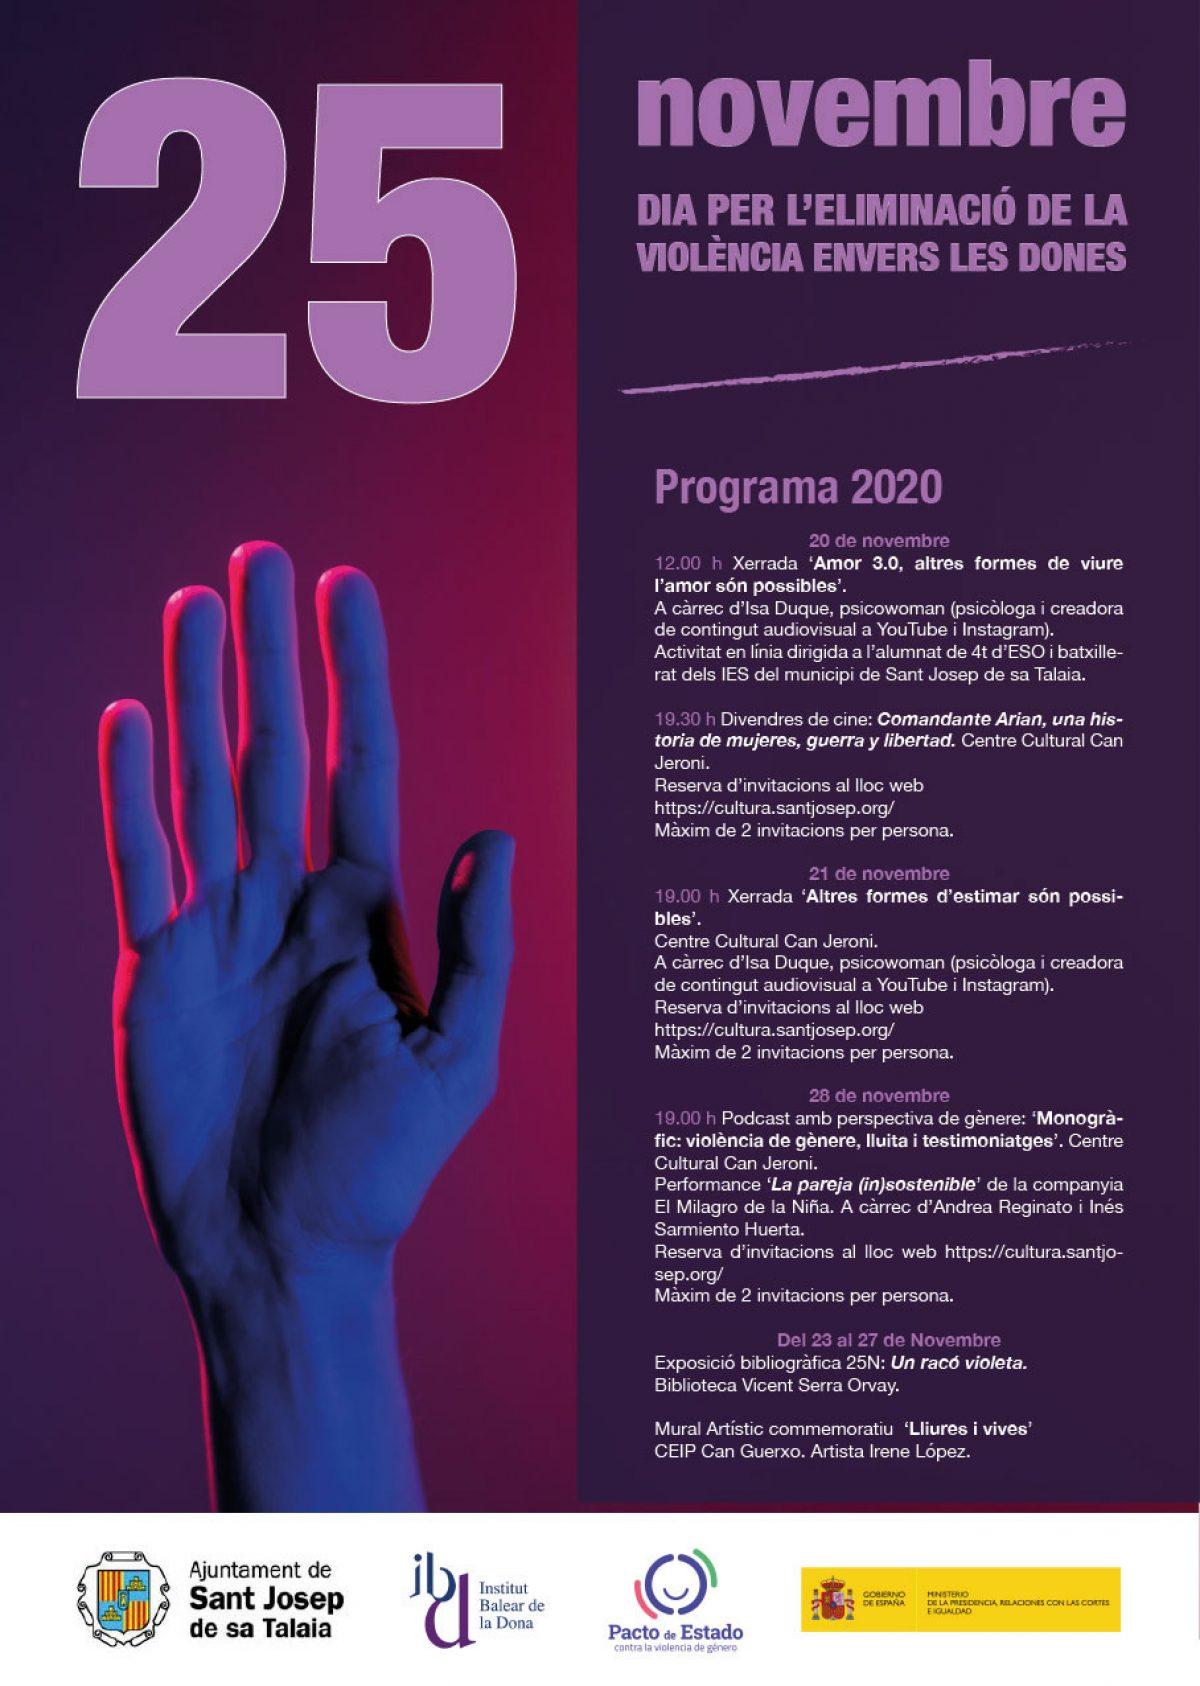 Programm-25-n-Tag-gegen-Gewalt-gegen-Frauen-San-Jose-Ibiza-2020-welcometoibiza